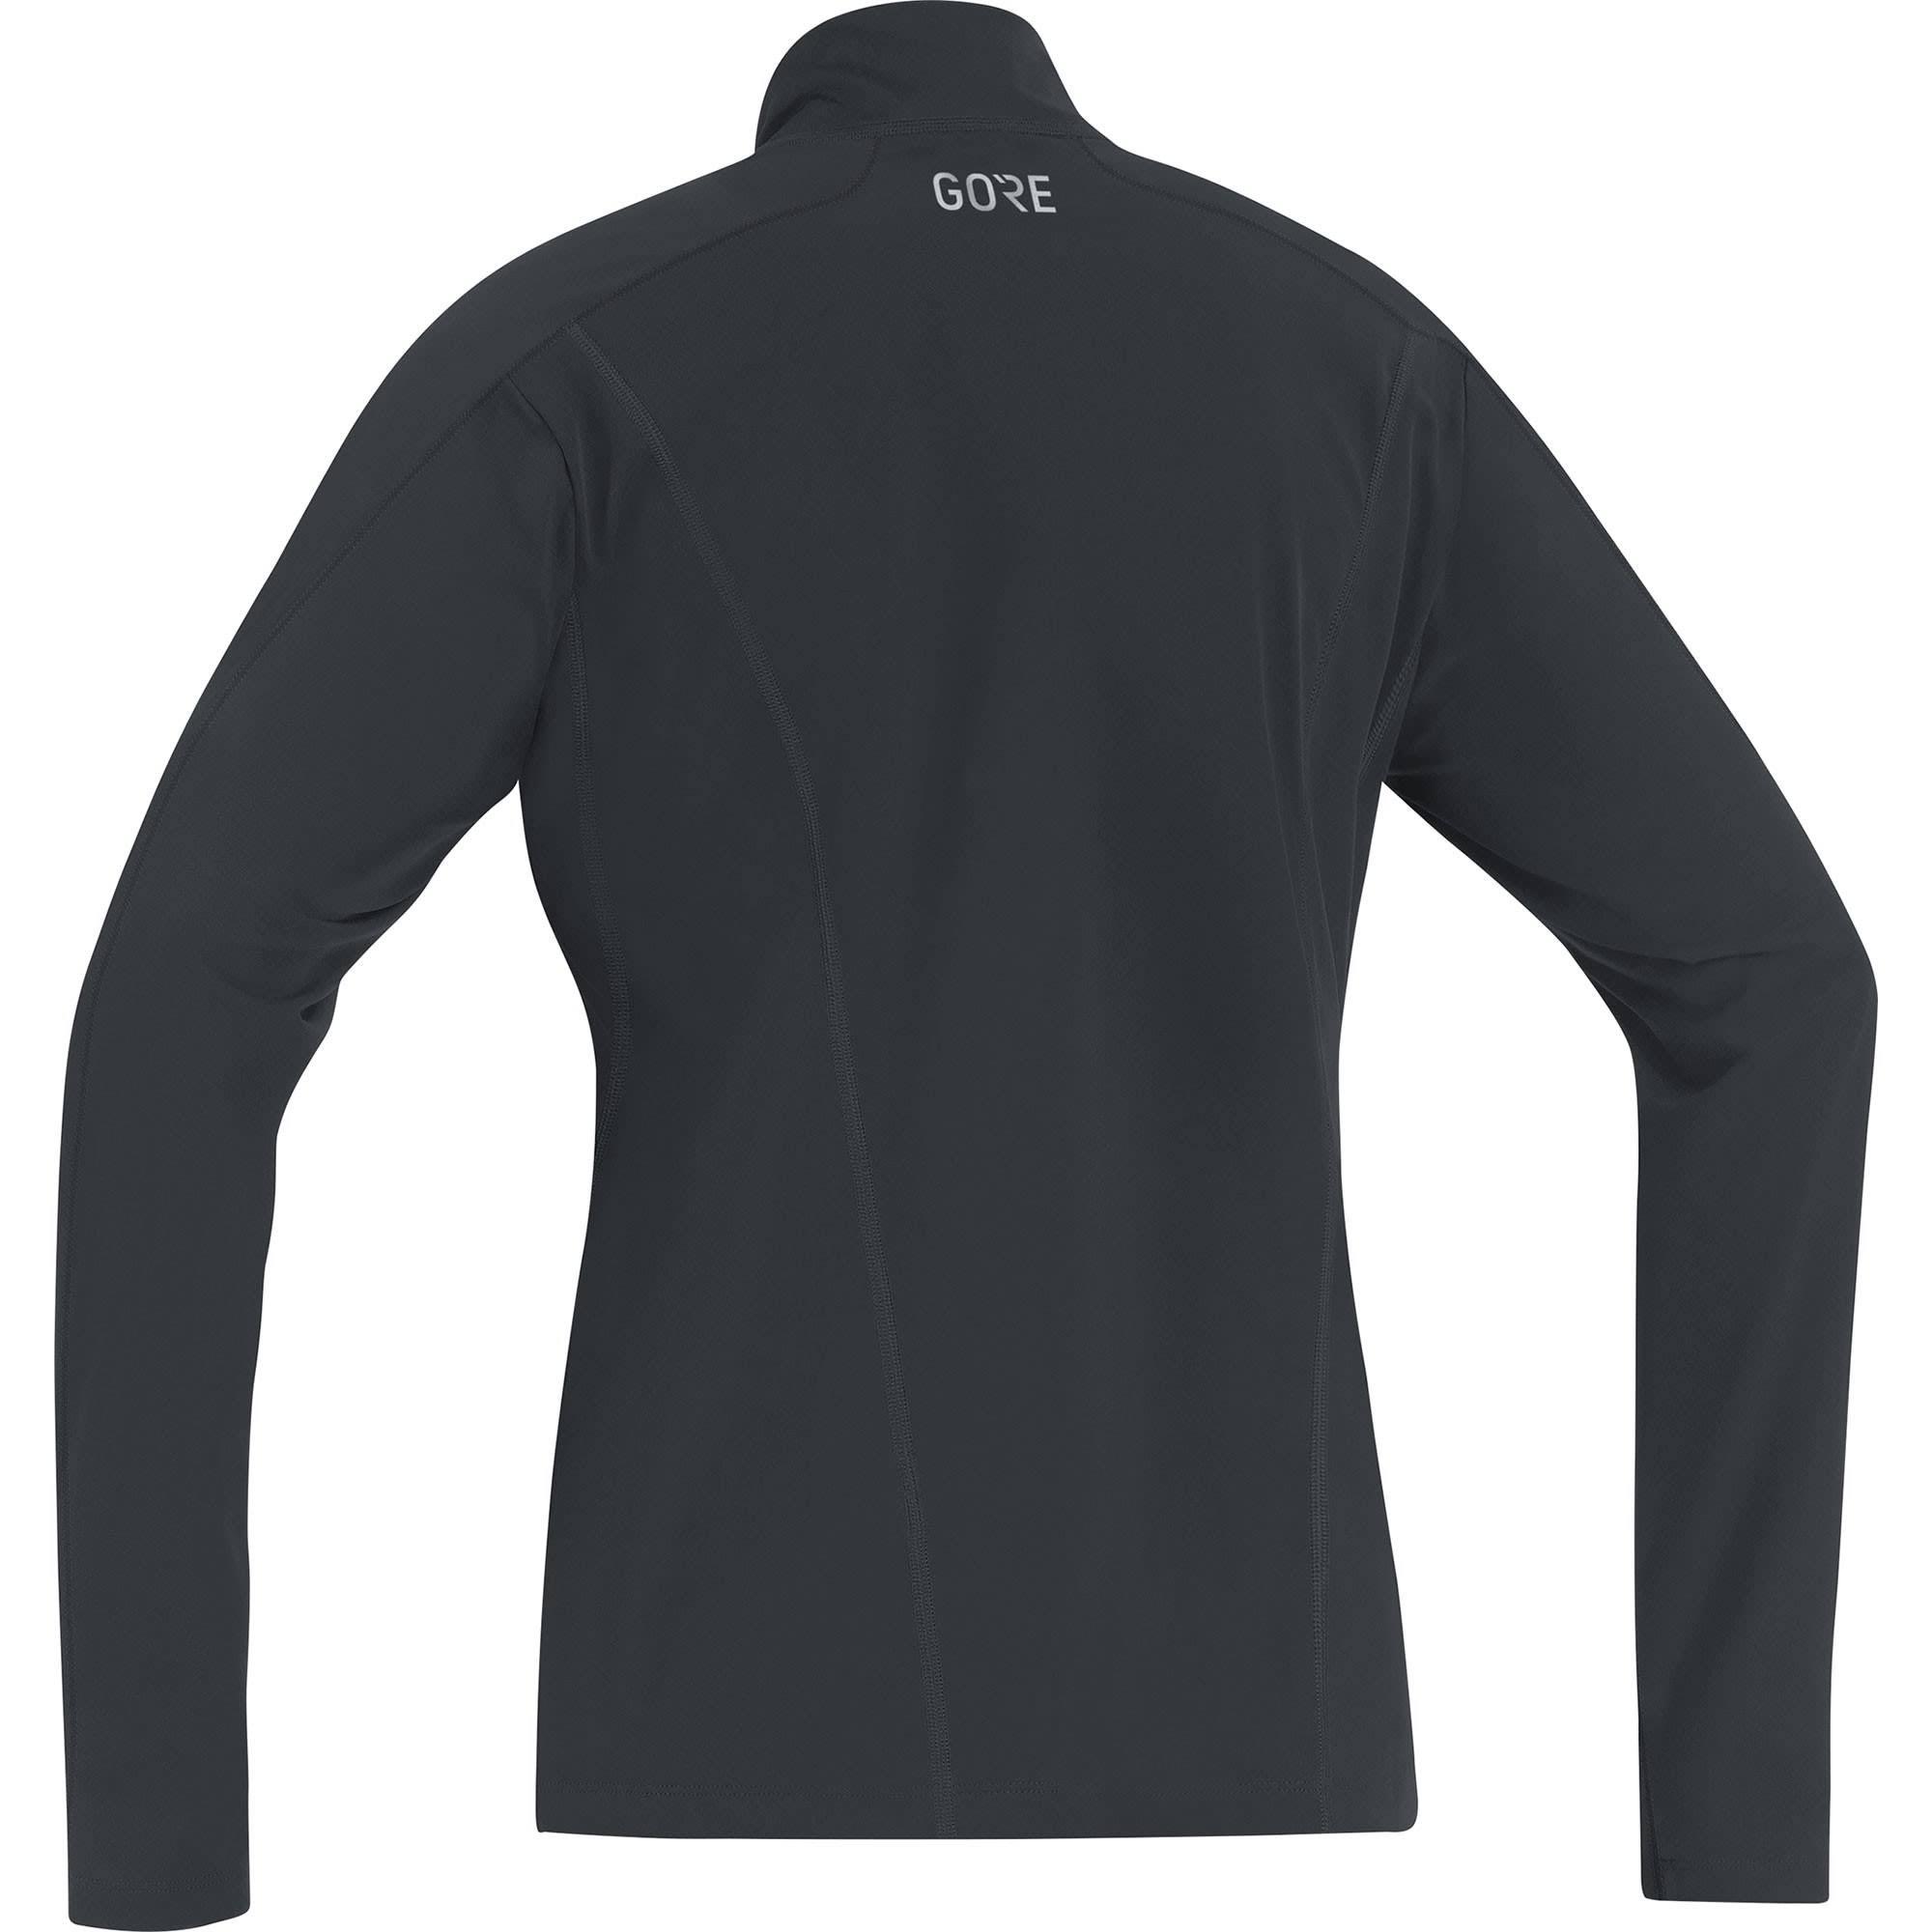 Langarm Schwarz Sleeve Long 34 Schwarz Damen Shirt Thermo Farbe Zip Gore shirt R3 t Größe Y81qH